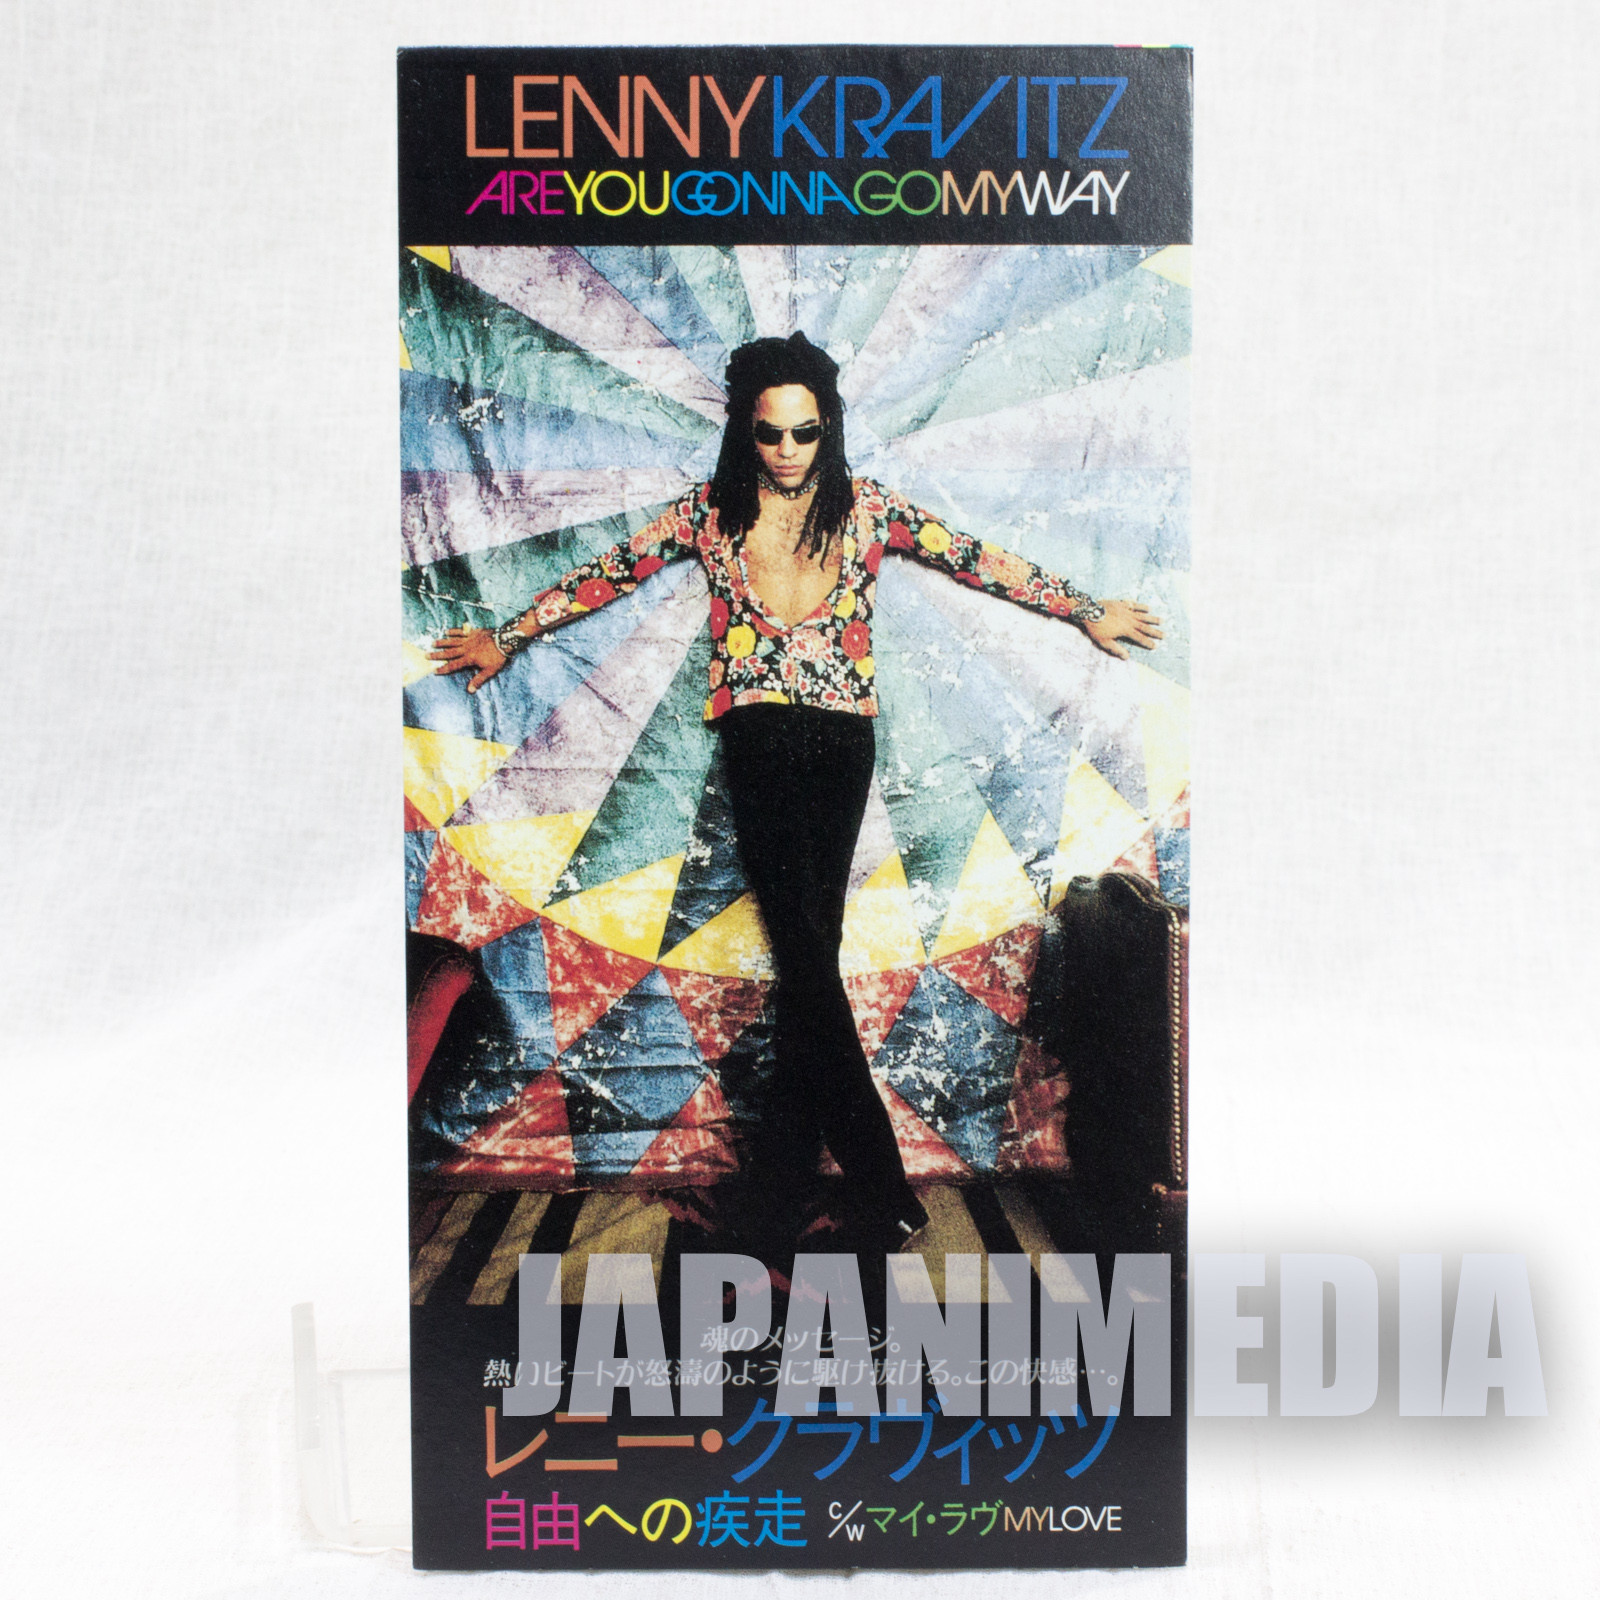 LENNY KRAVITZ ARE YOU GONNA GO MY WAY Japan 1993 8cm 3inch CD Single